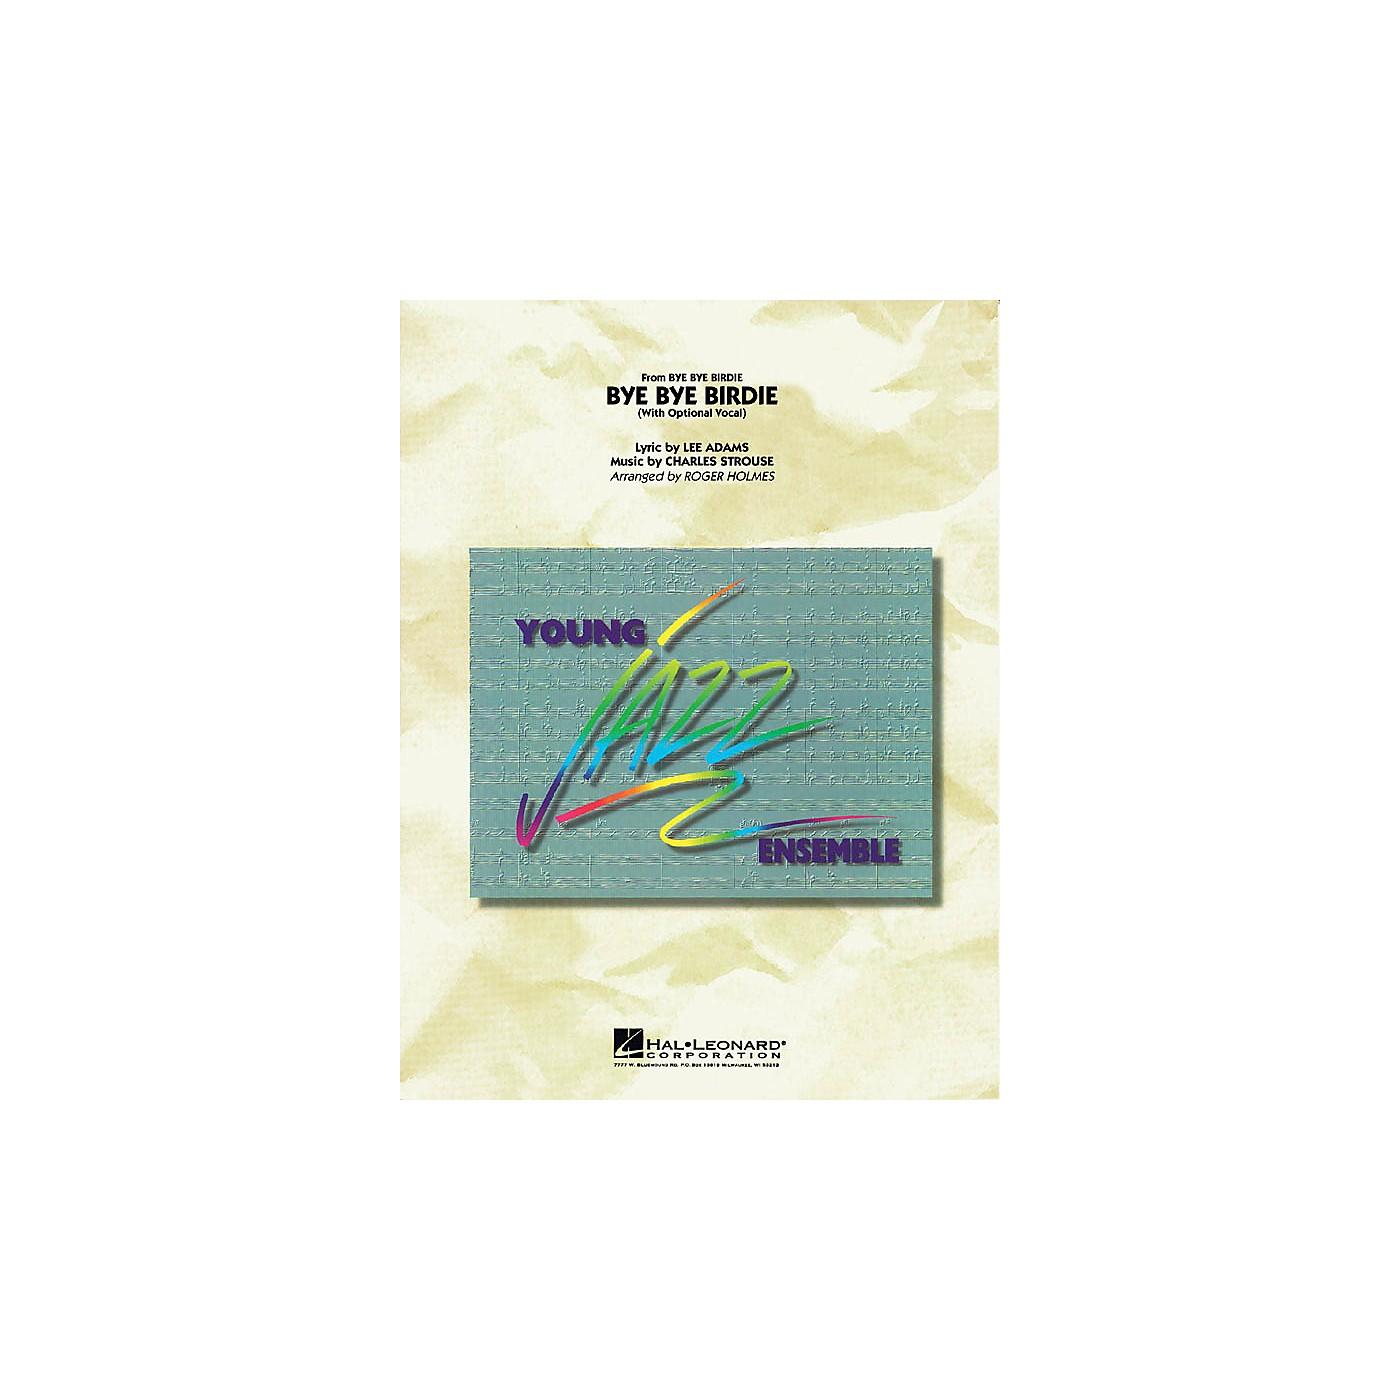 Hal Leonard Bye Bye Birdie (w/ opt. vocal) Jazz Band Level 3 Arranged by Roger Holmes thumbnail